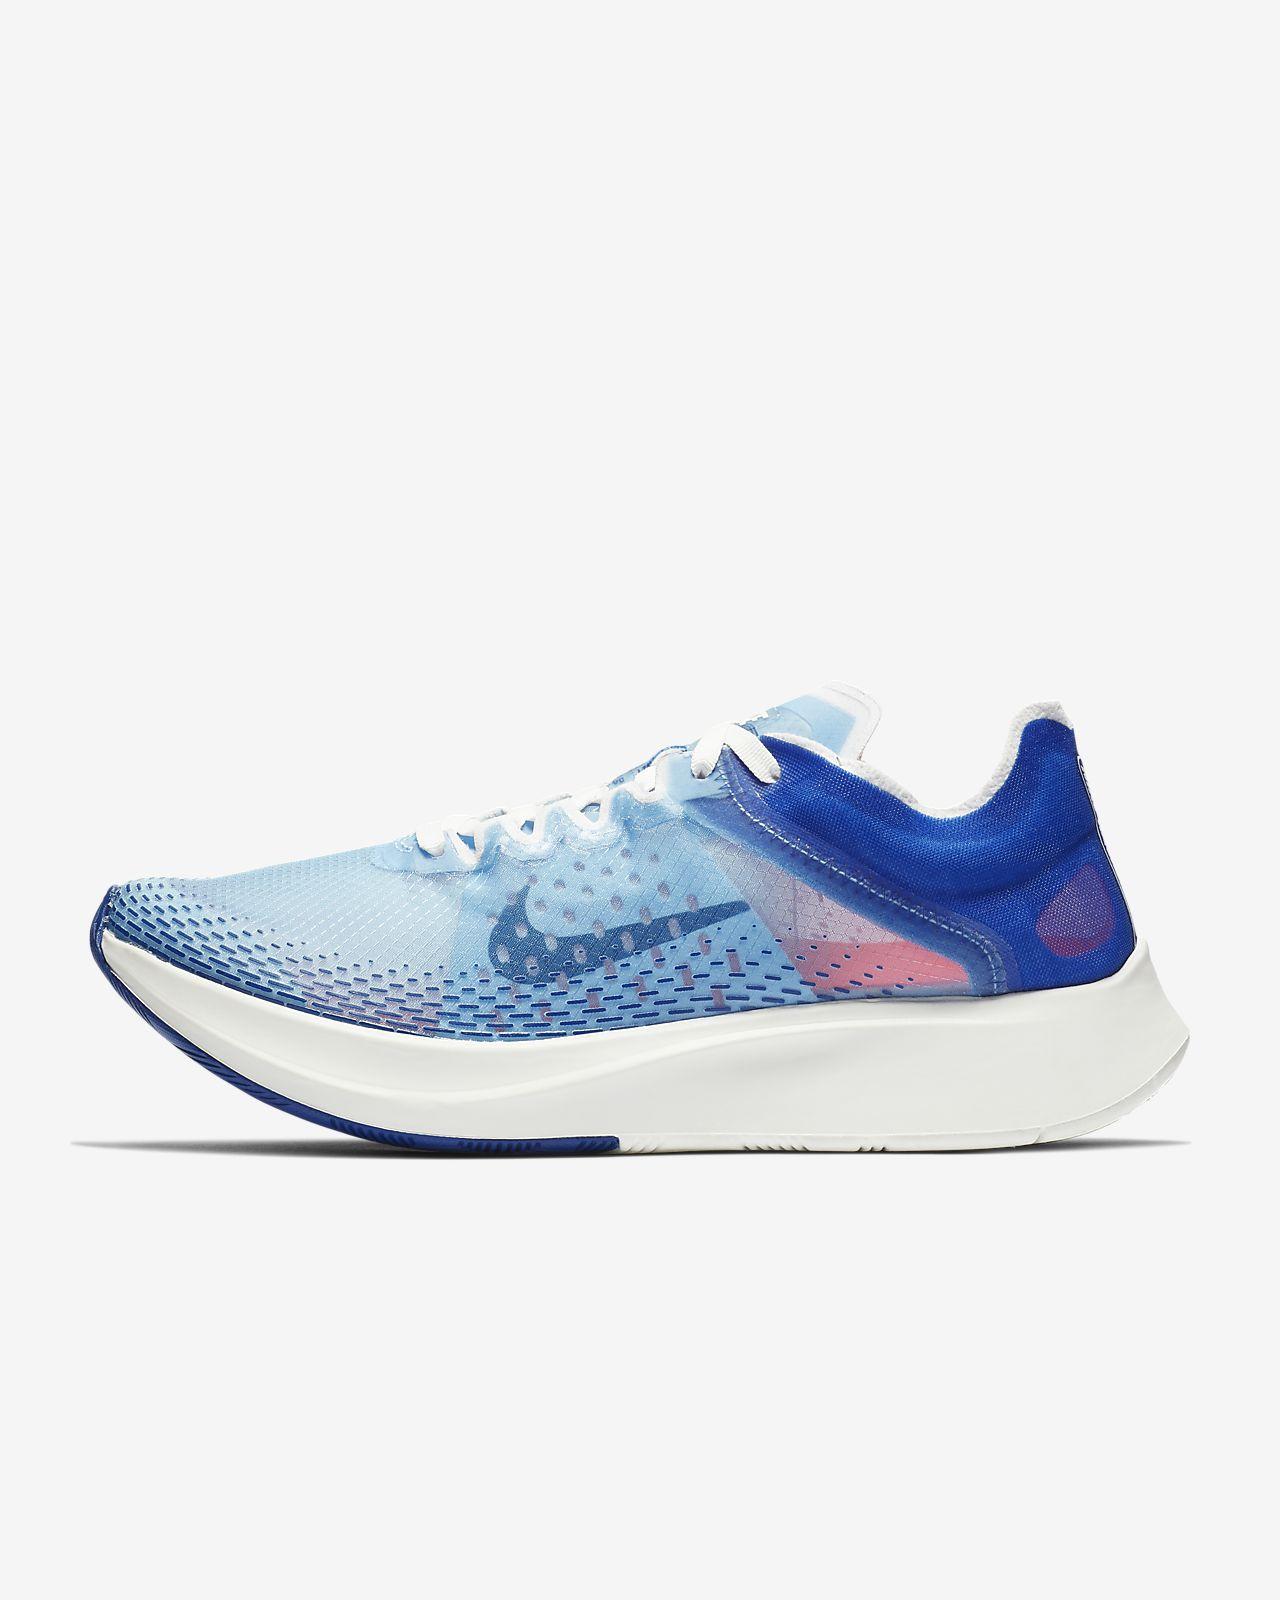 Nike Zoom Fly SP Fast női futócipő